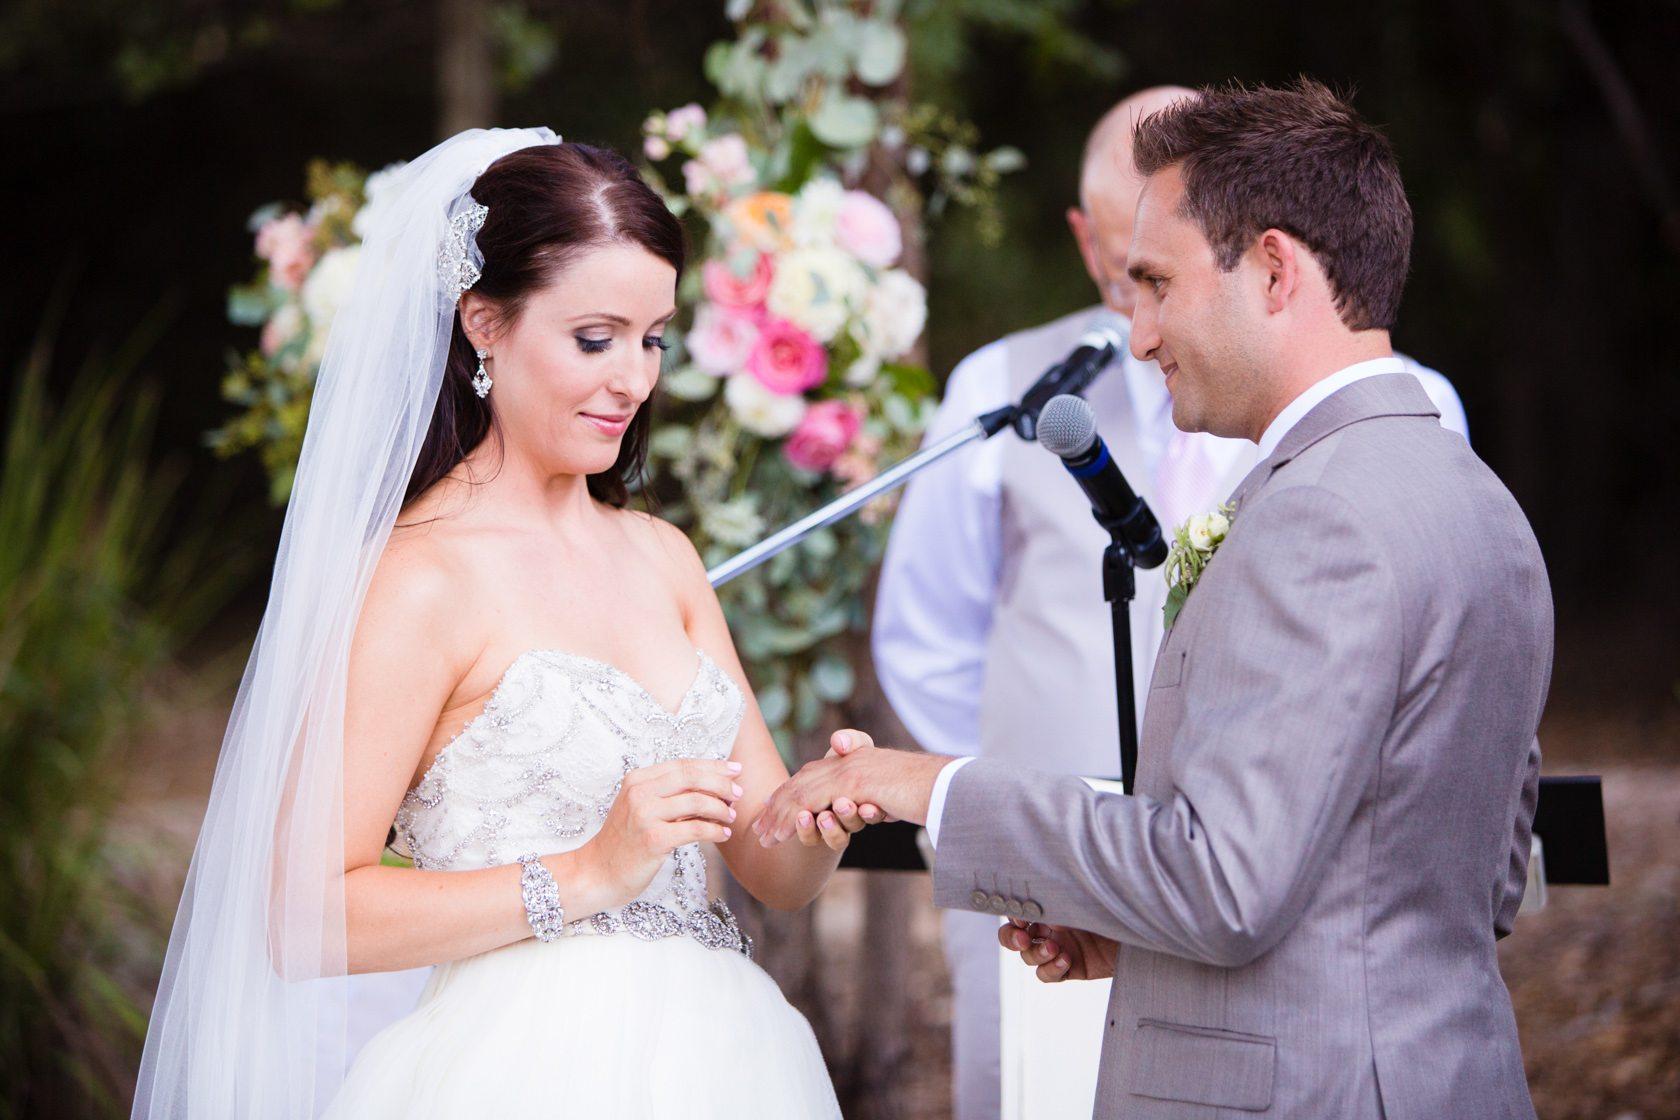 Temecula_Creek_Inn_Wedding_096.jpg